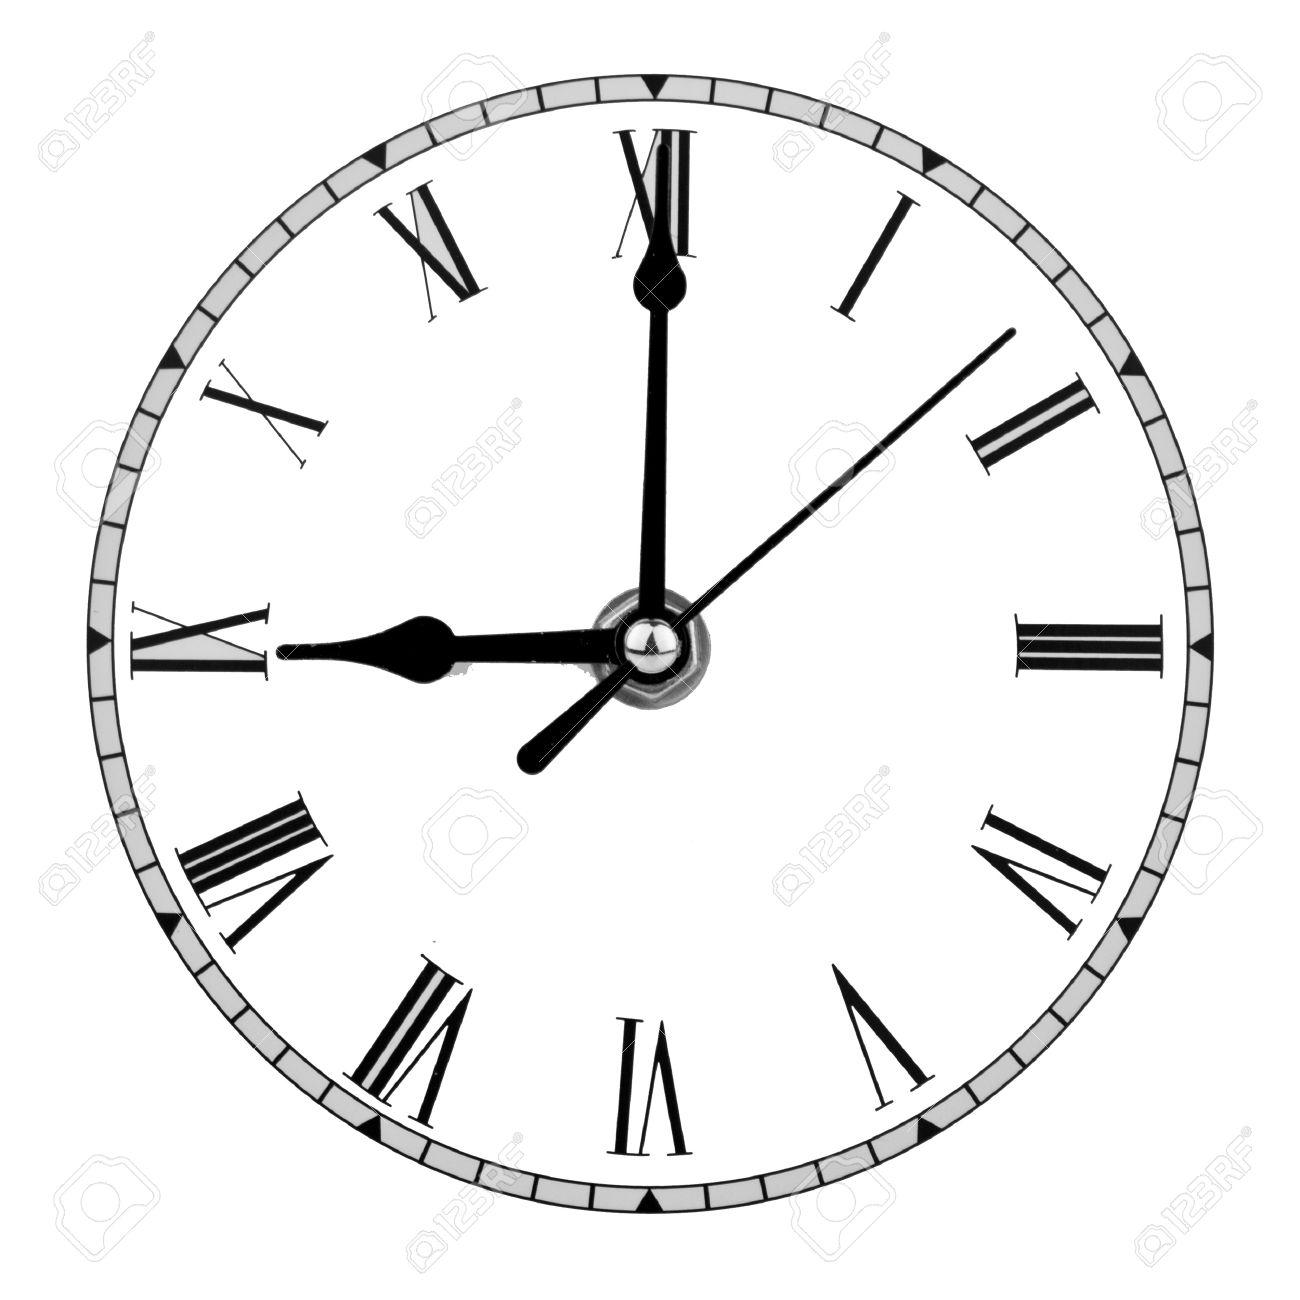 worksheet Analog Clock Face analogue clock face displaying nine oclock stock photo picture 16048227